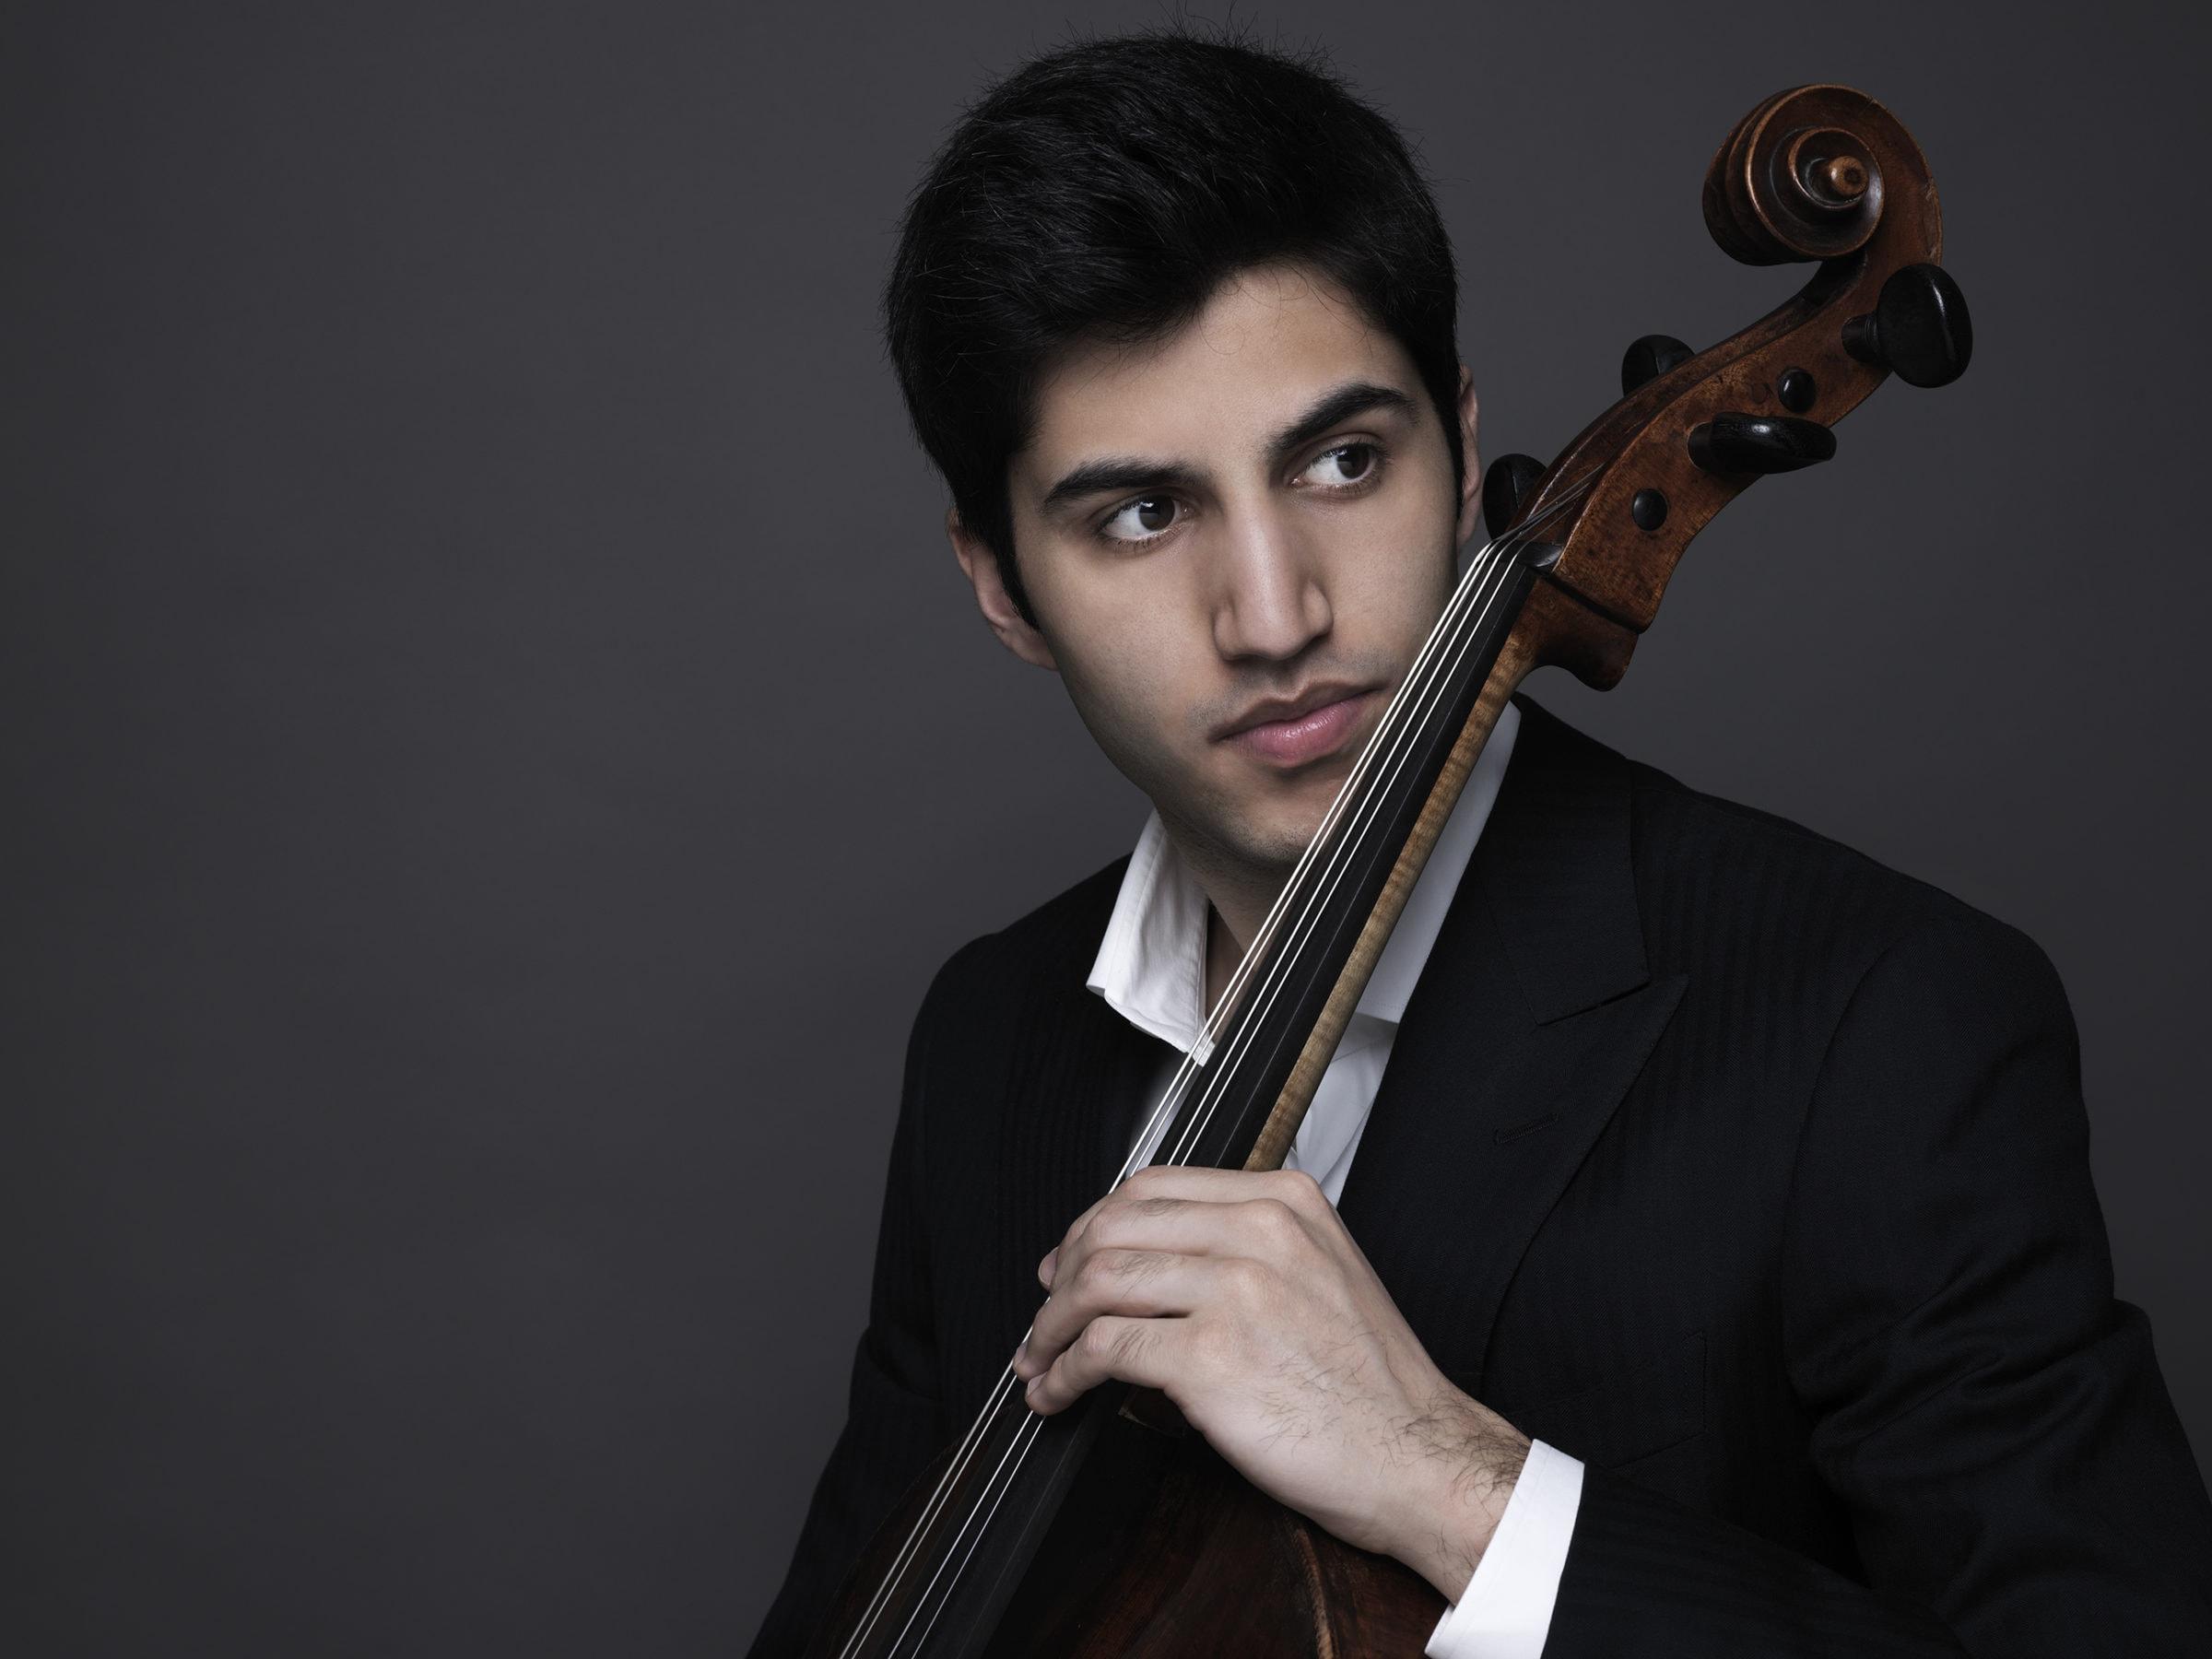 Cellist Kian Soltani. Photo by Juventino Mateo.